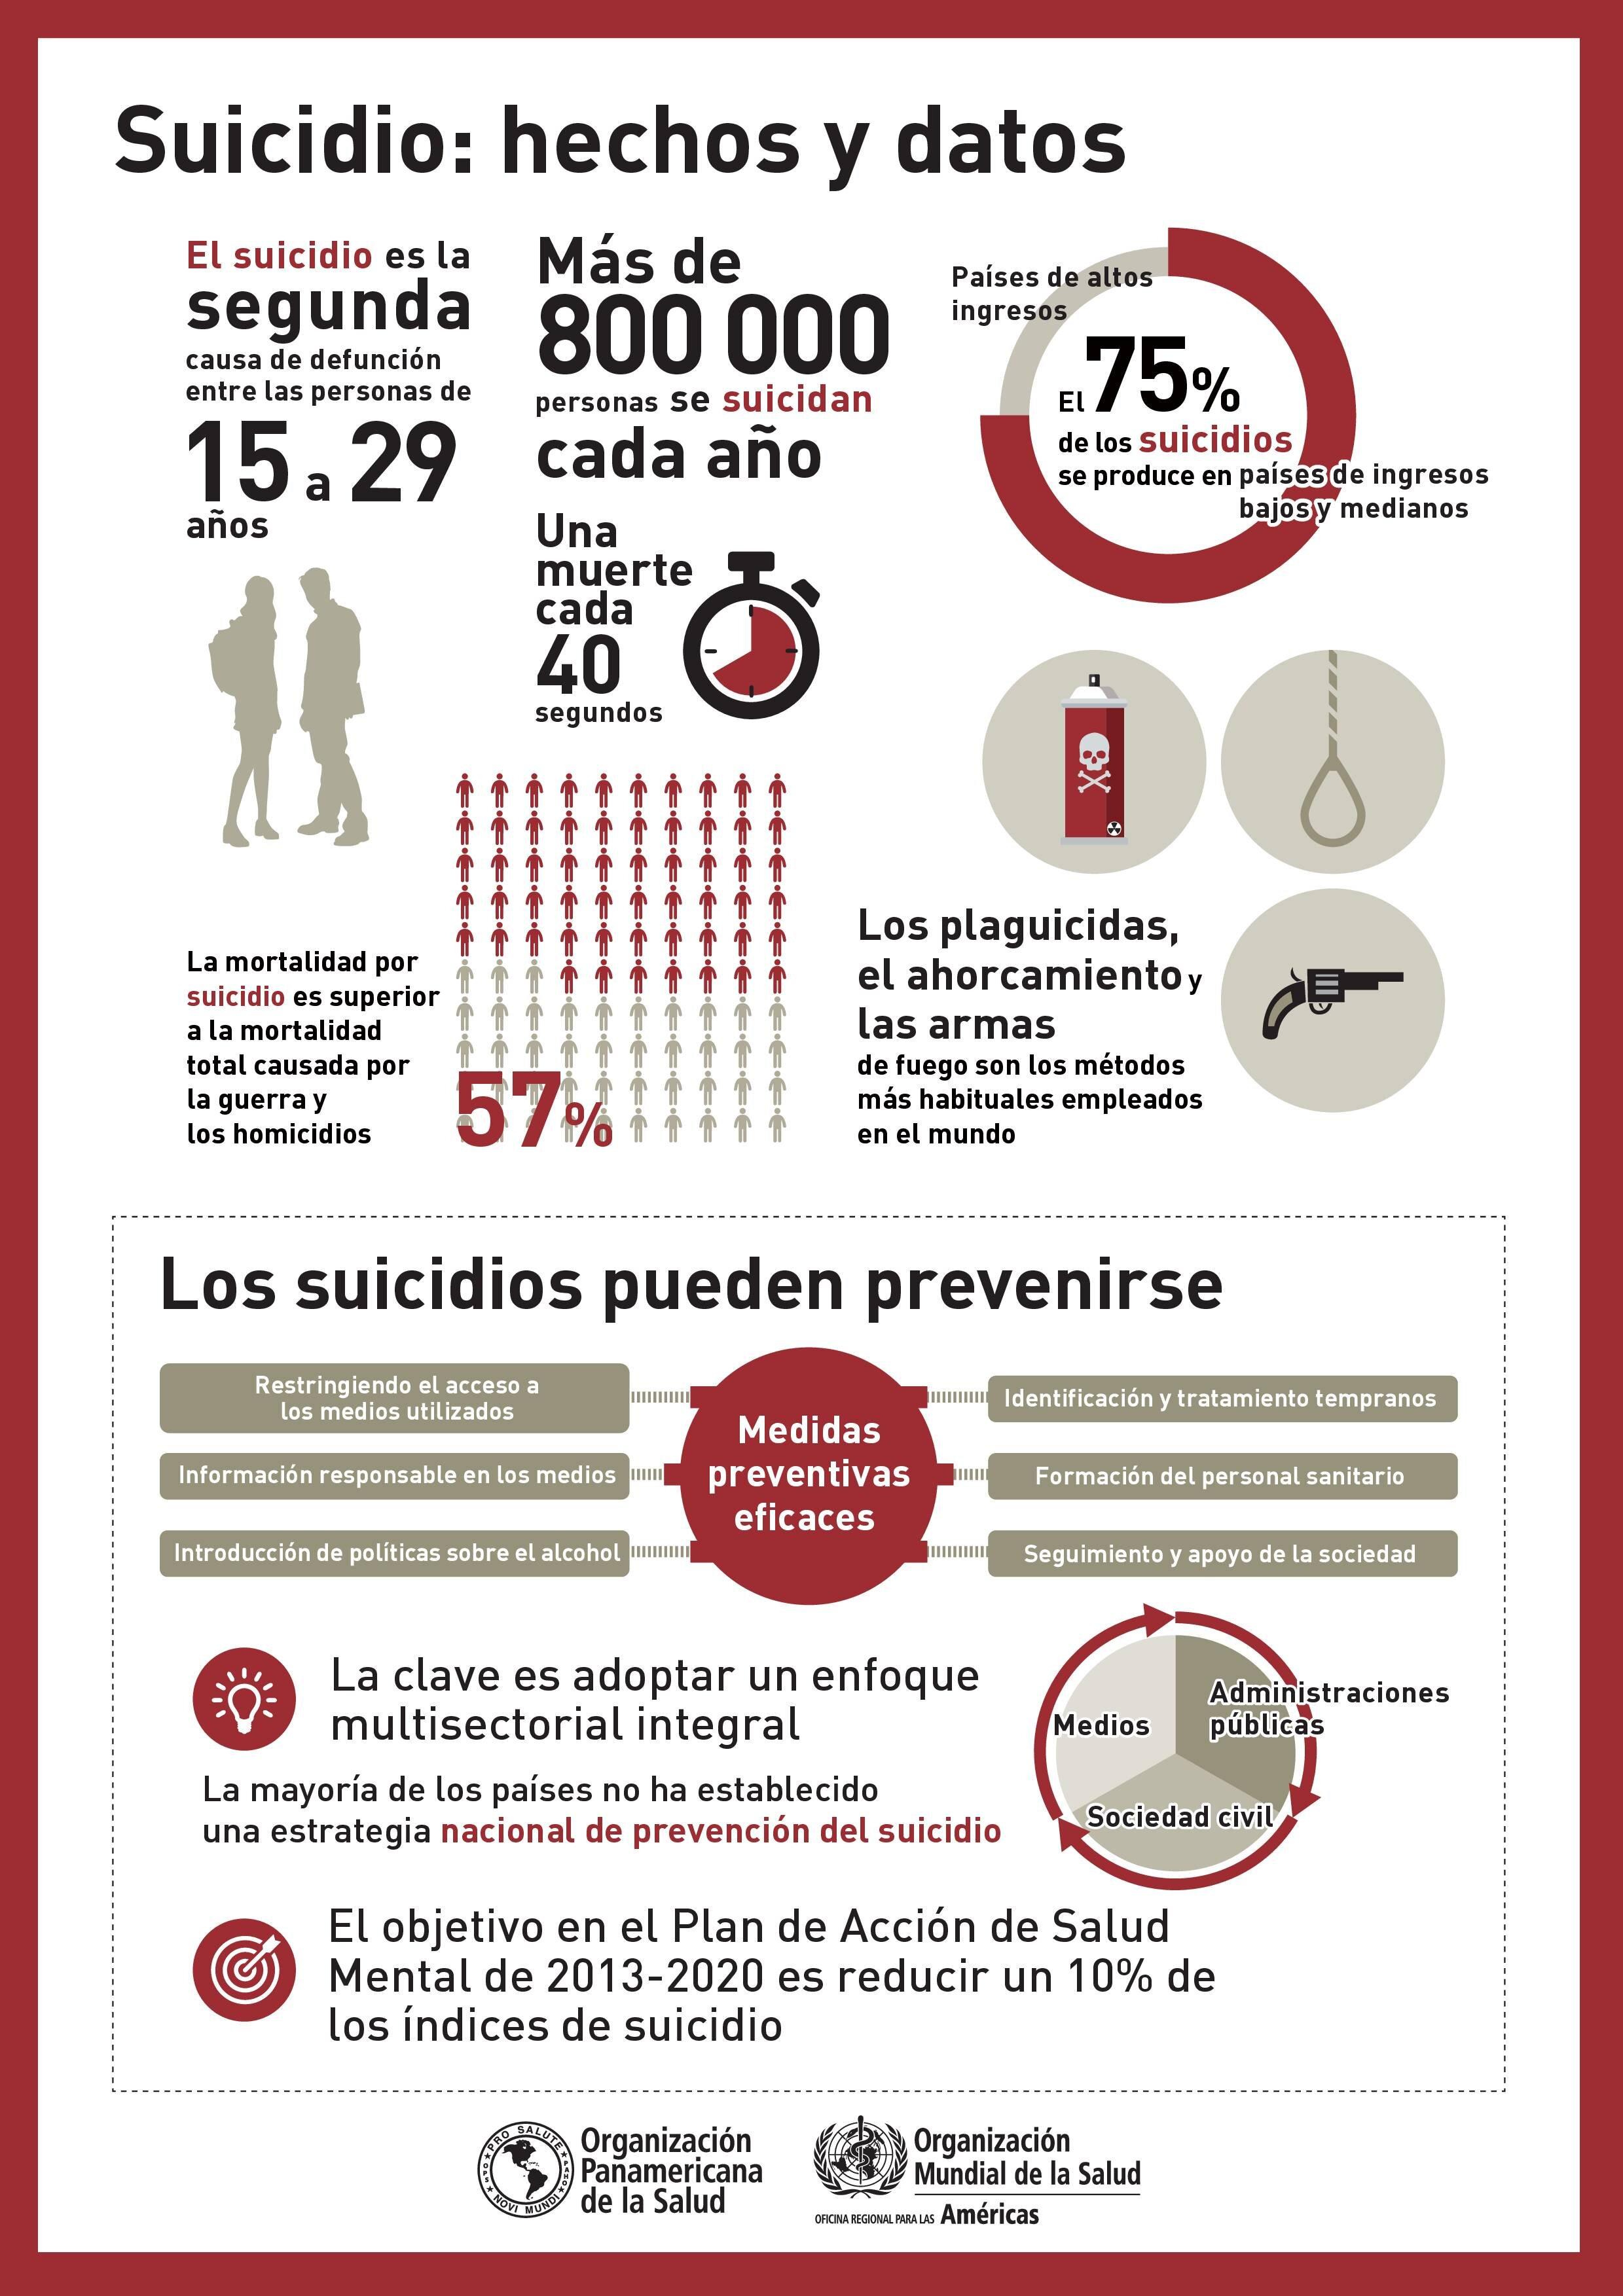 suicide-infographic-es.jpg